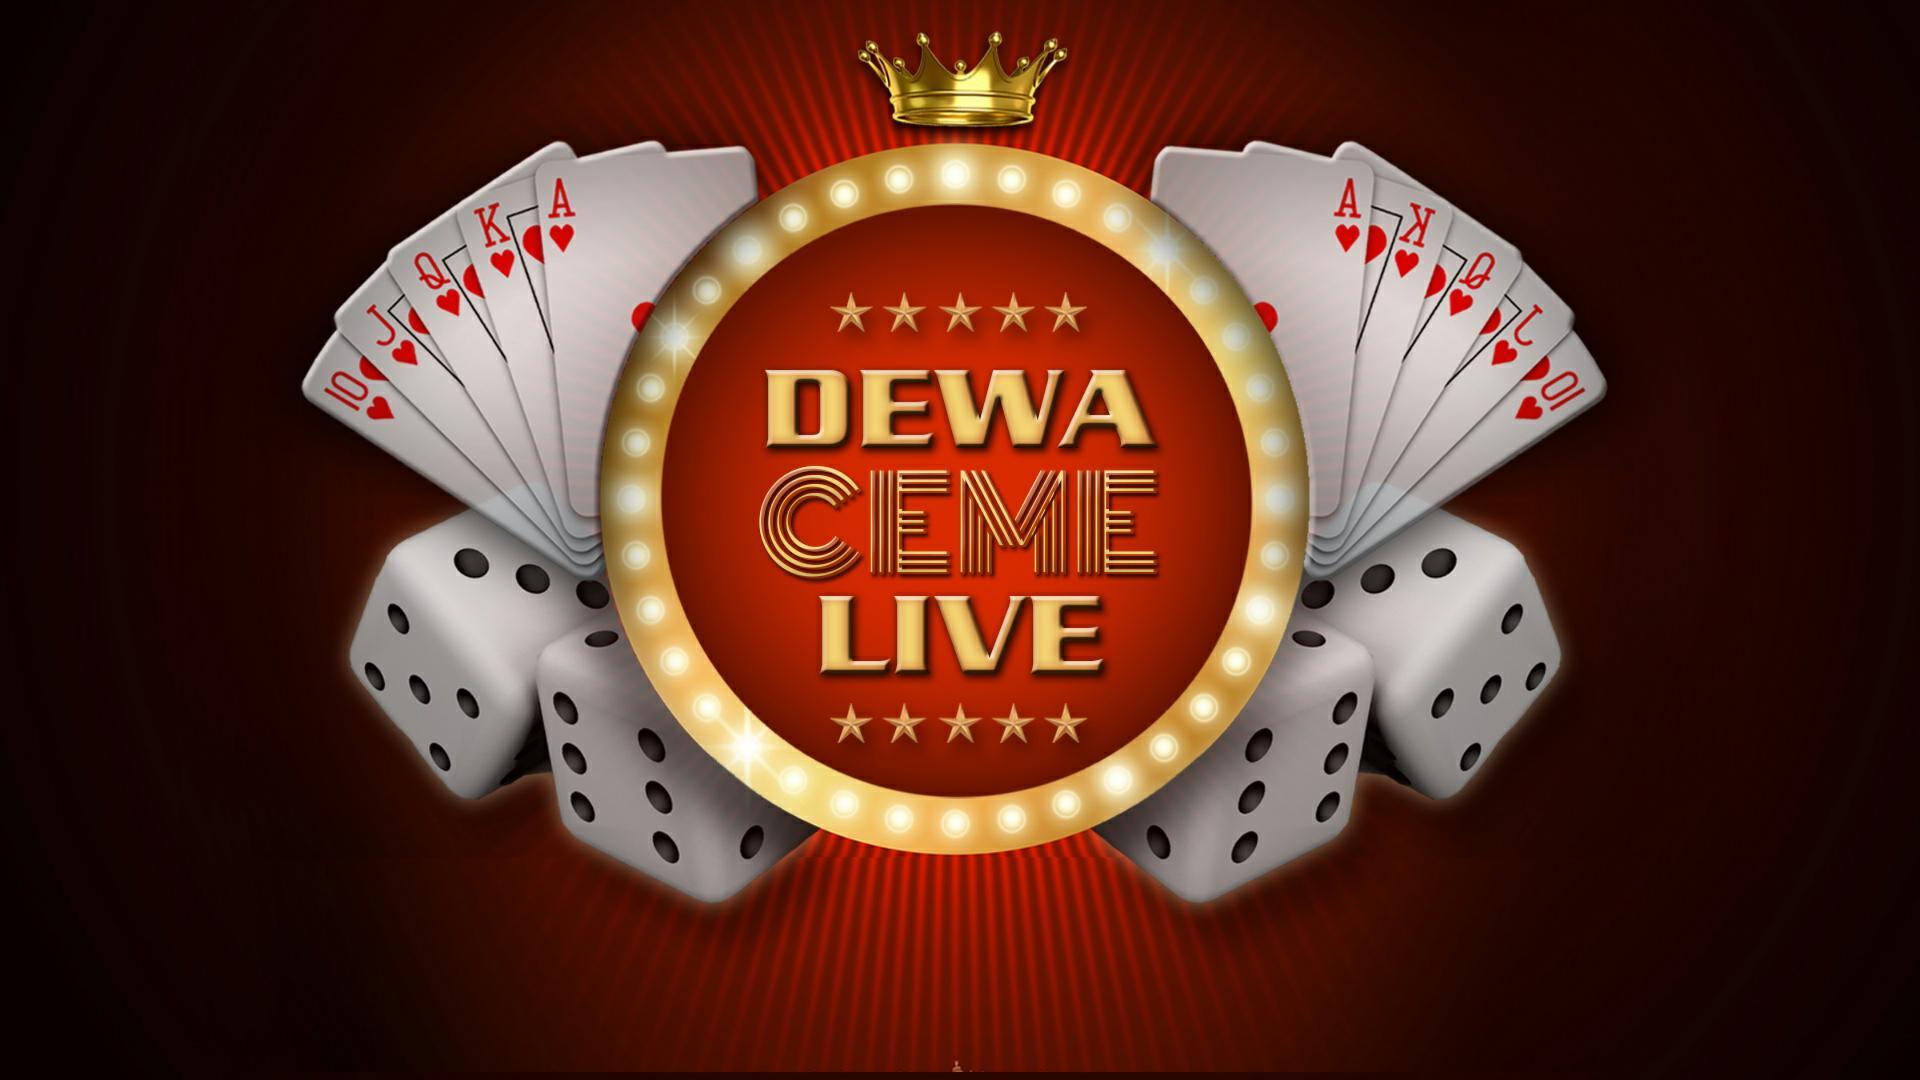 Dewa Domino Ceme For Android Apk Download